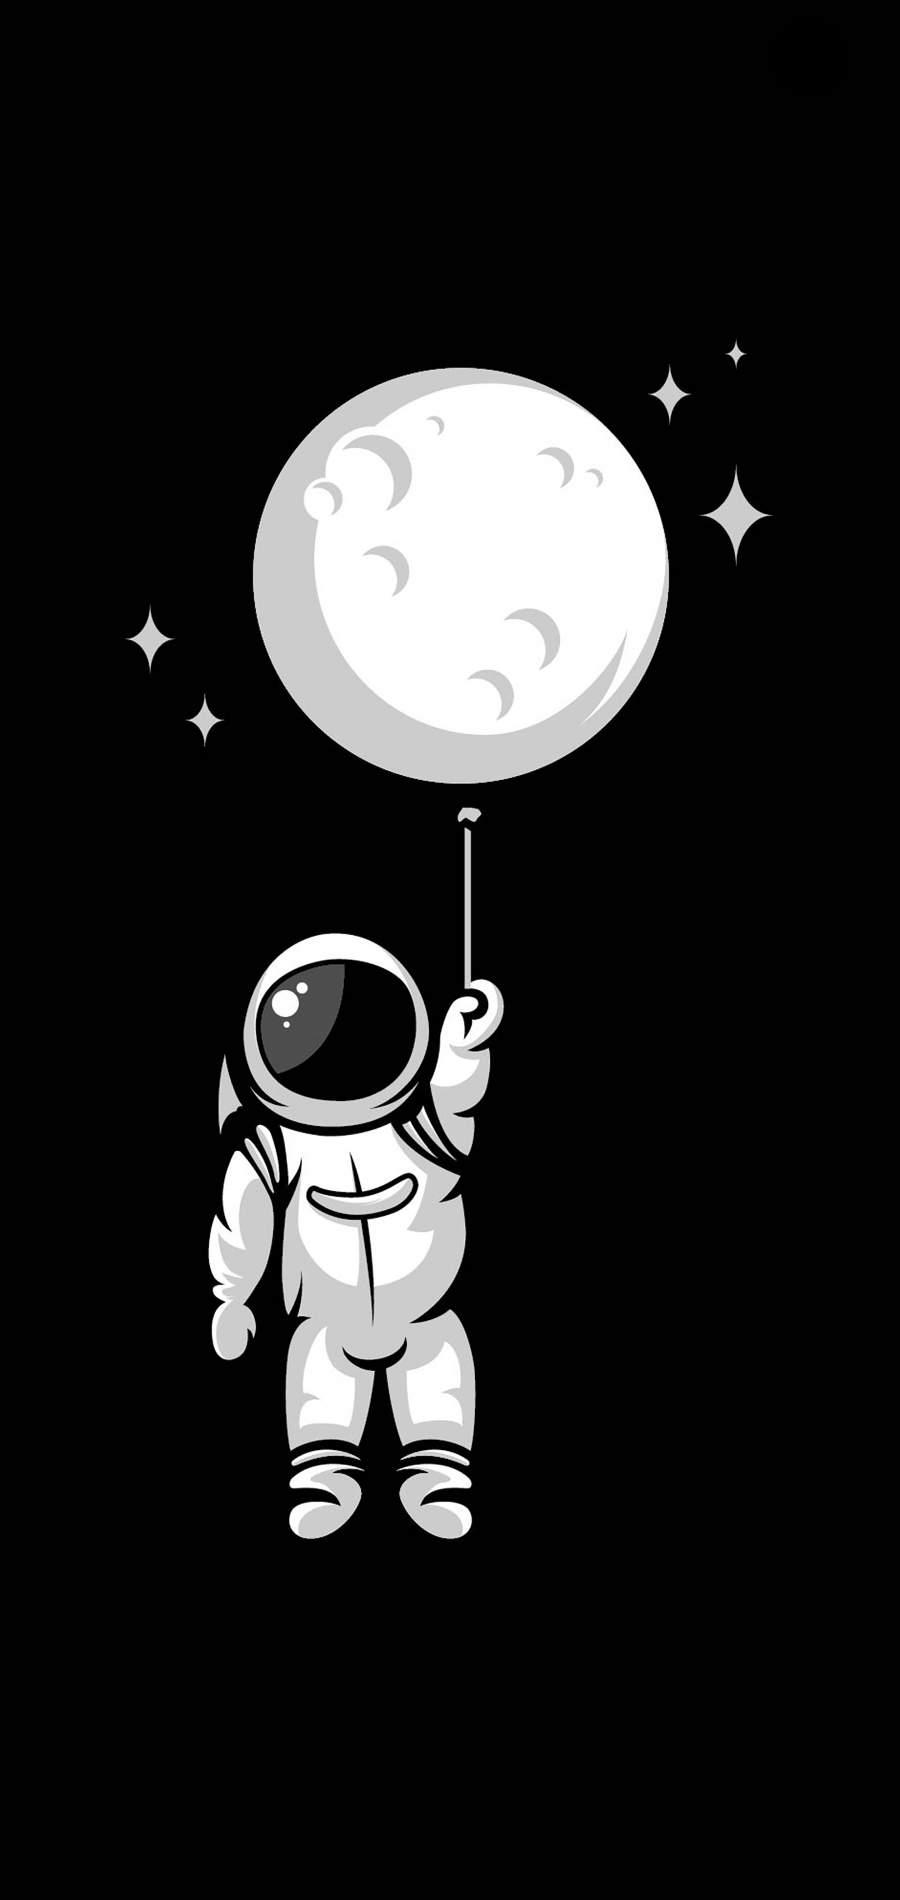 Astronaut Balloon iPhone Wallpaper